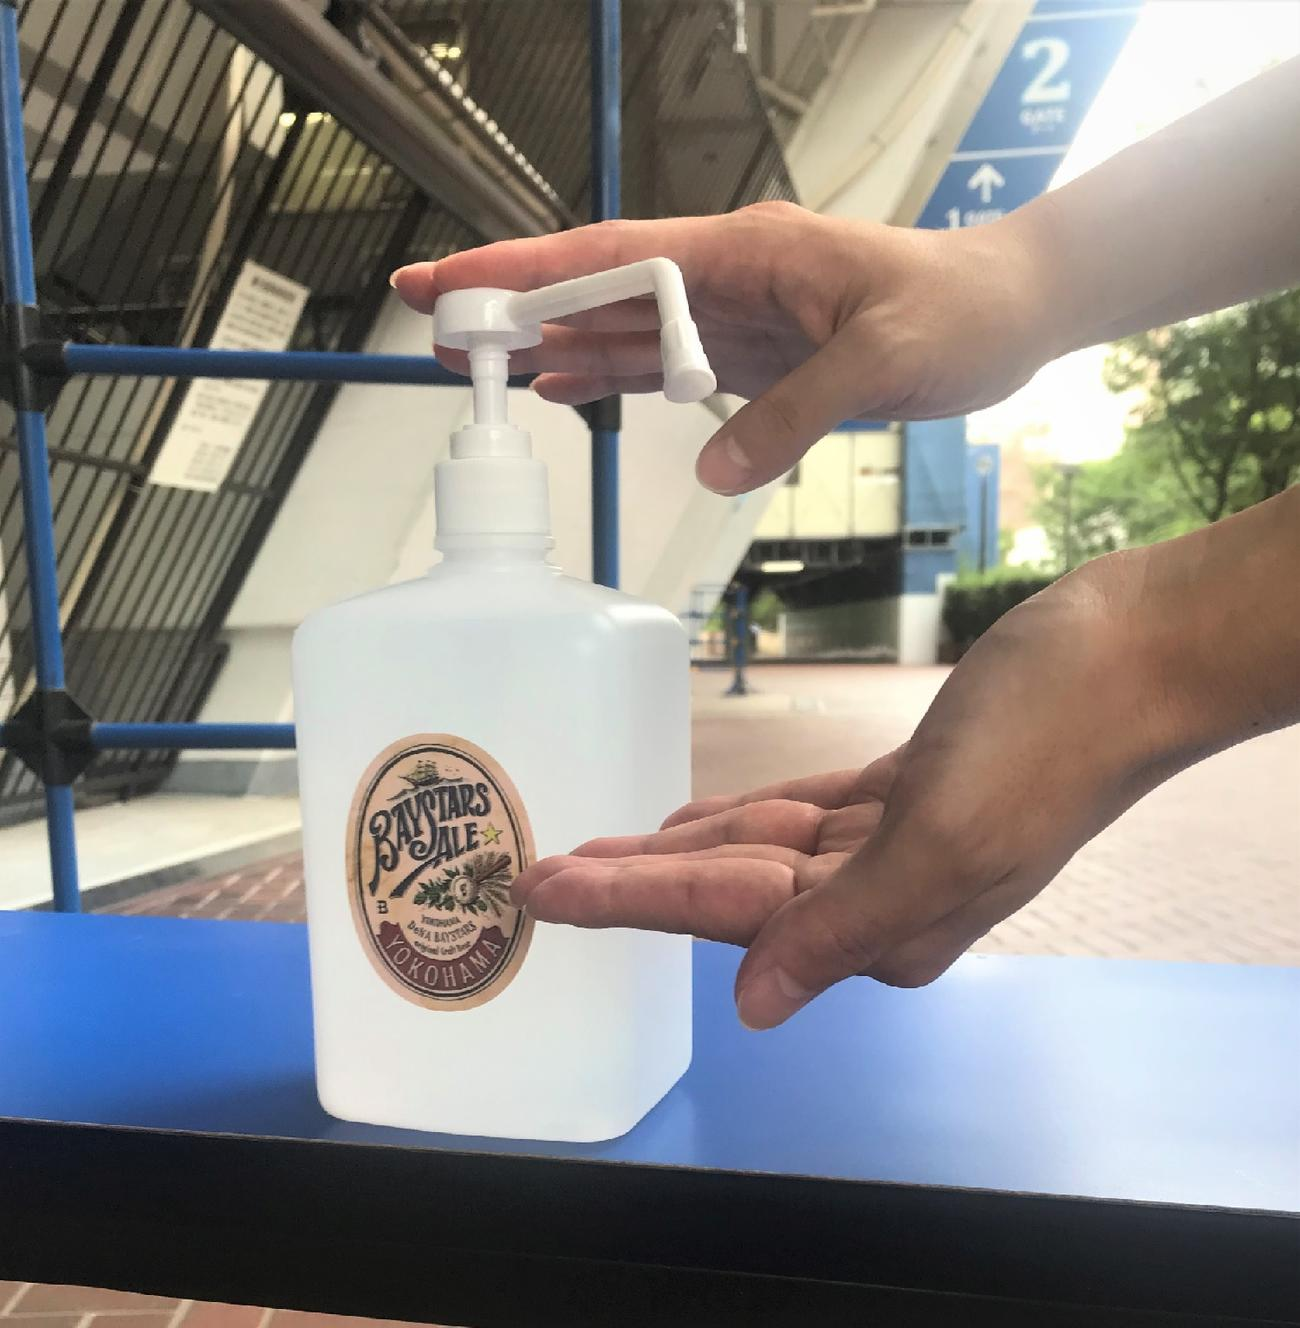 DeNAは球団オリジナル醸造ビールから手指消毒用アルコールを製造した(球団提供)